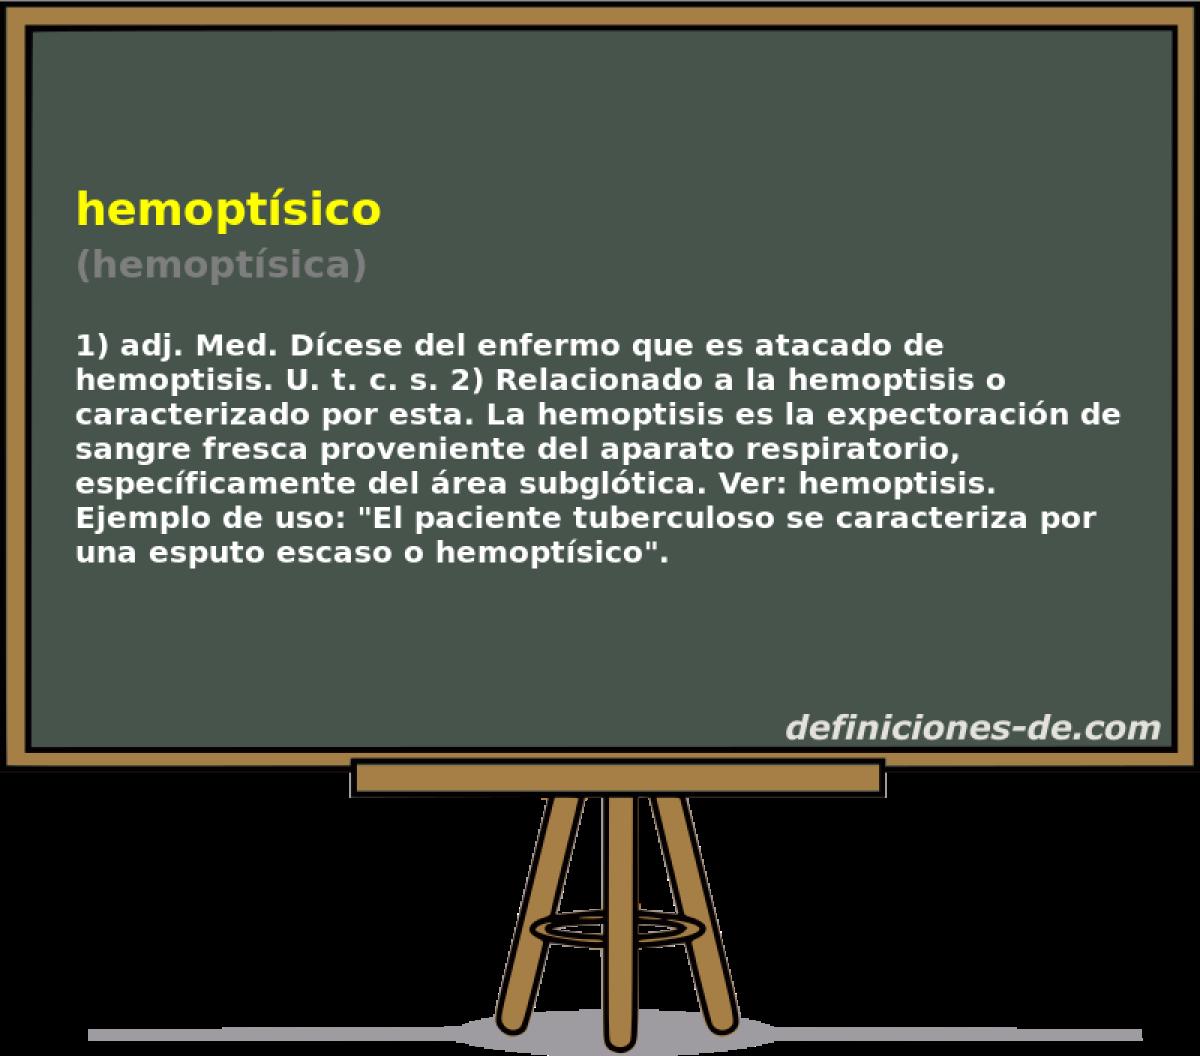 Qué significa Hemoptísico (hemoptísica)?